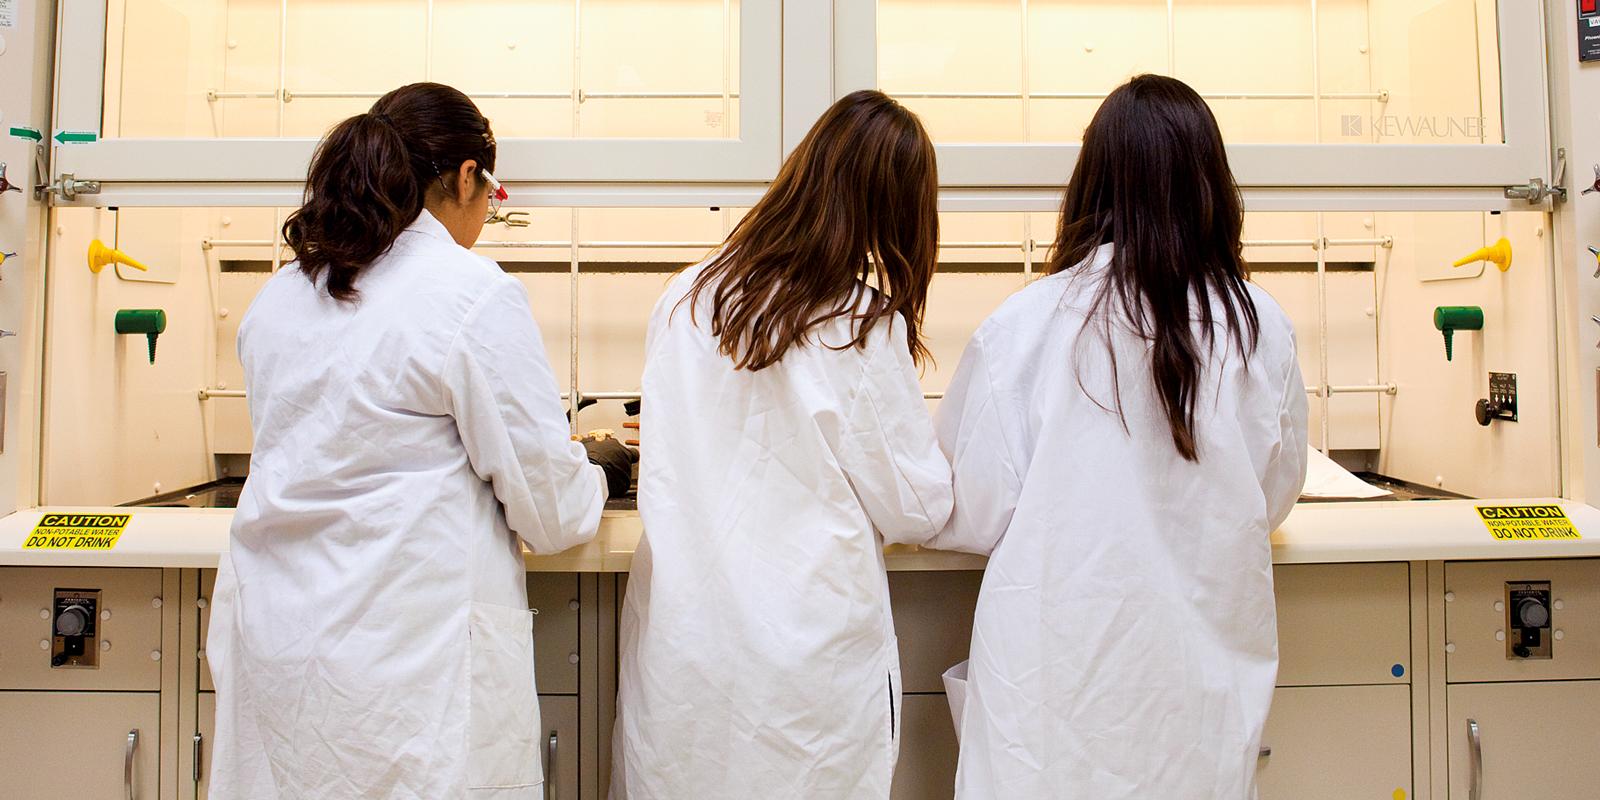 Girls in science coats